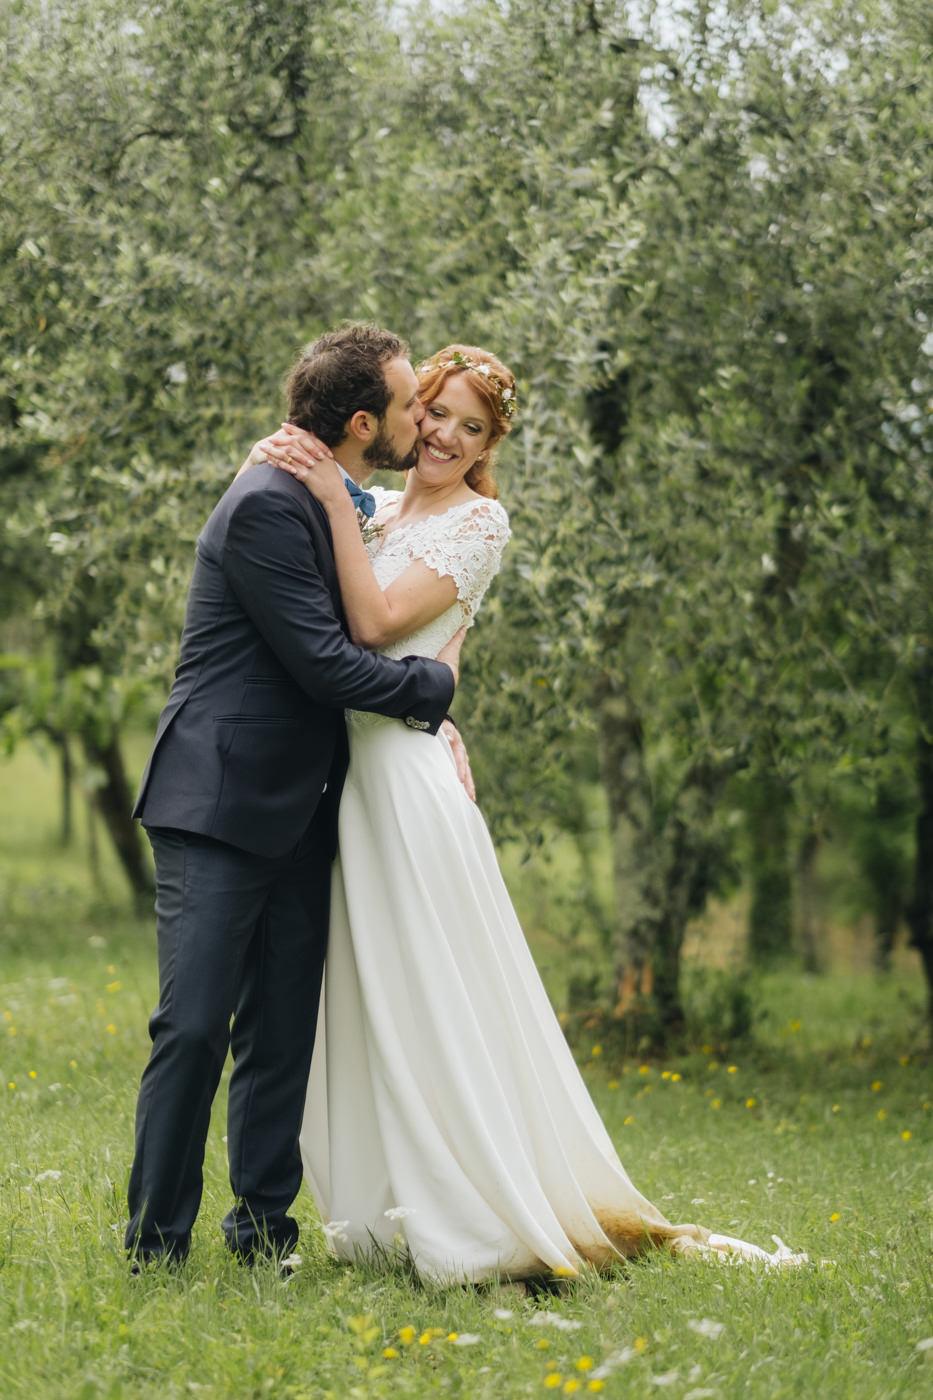 matrimoni_all_italiana_fotografo_matrimonio_toscana-57.jpg